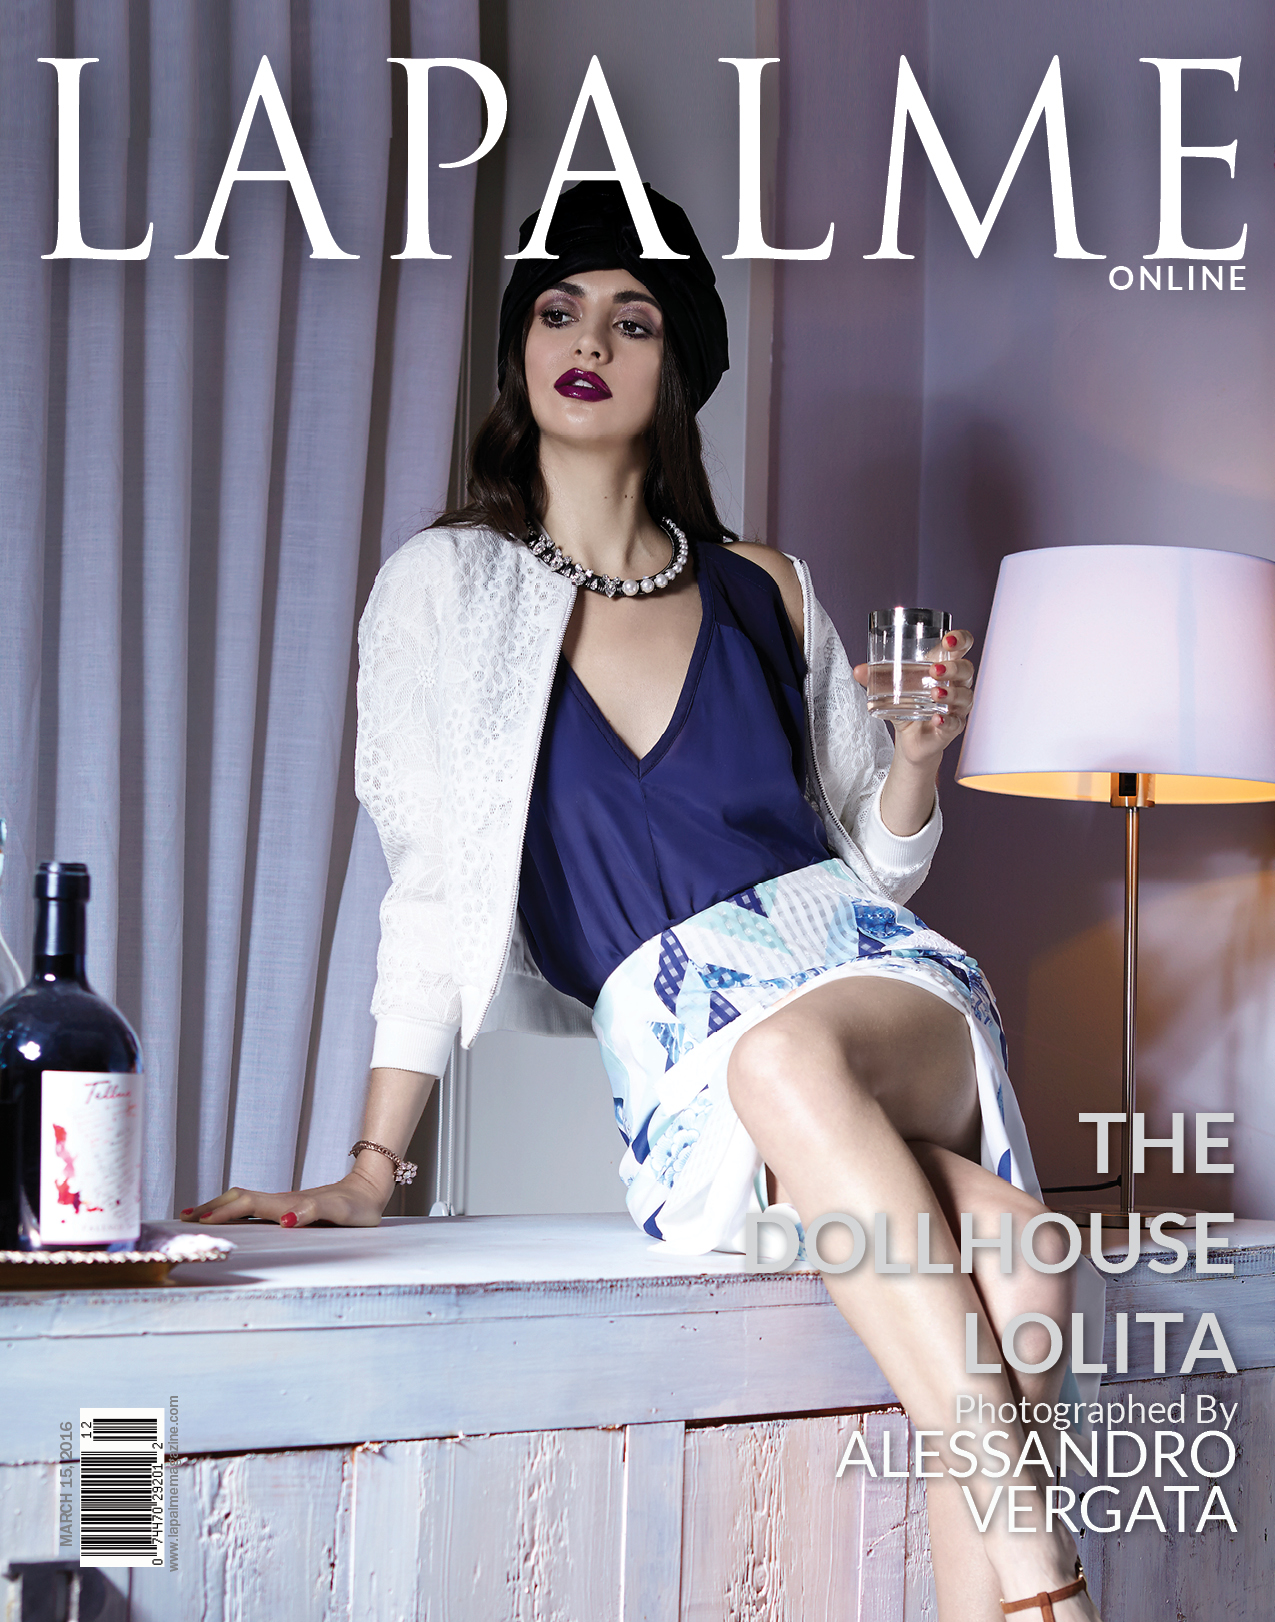 The Dollhouse Lolita